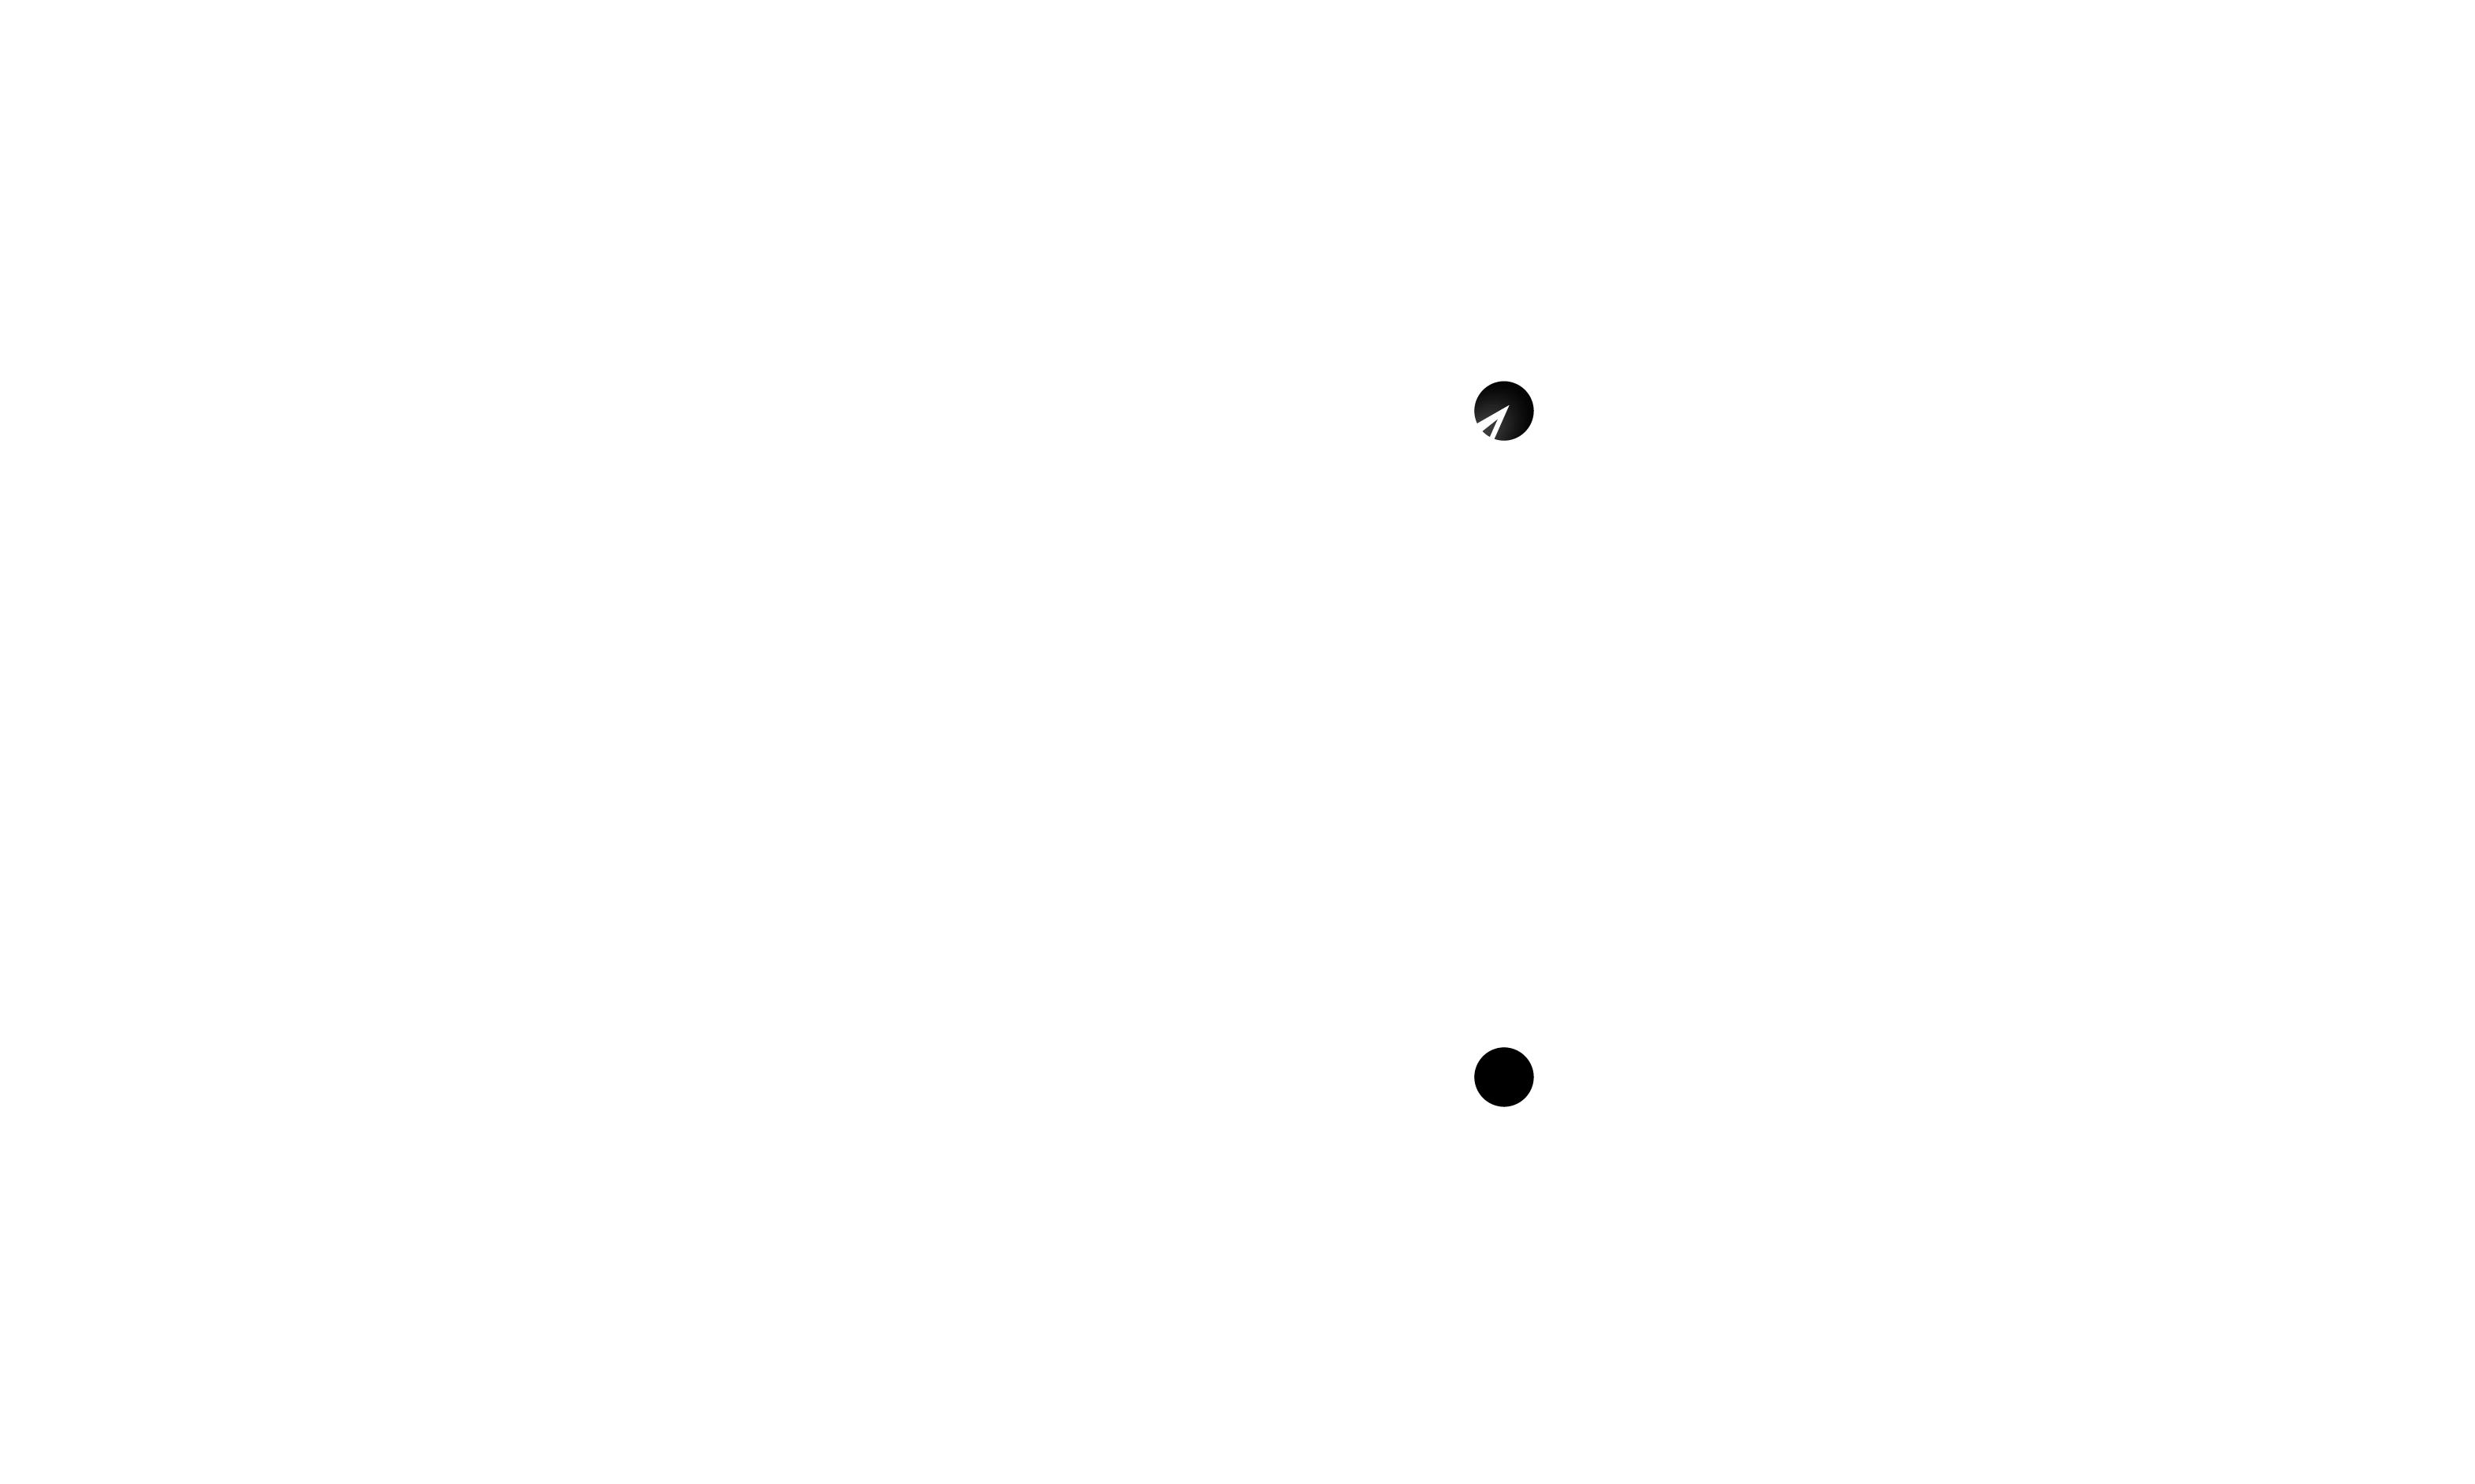 orbiter_4